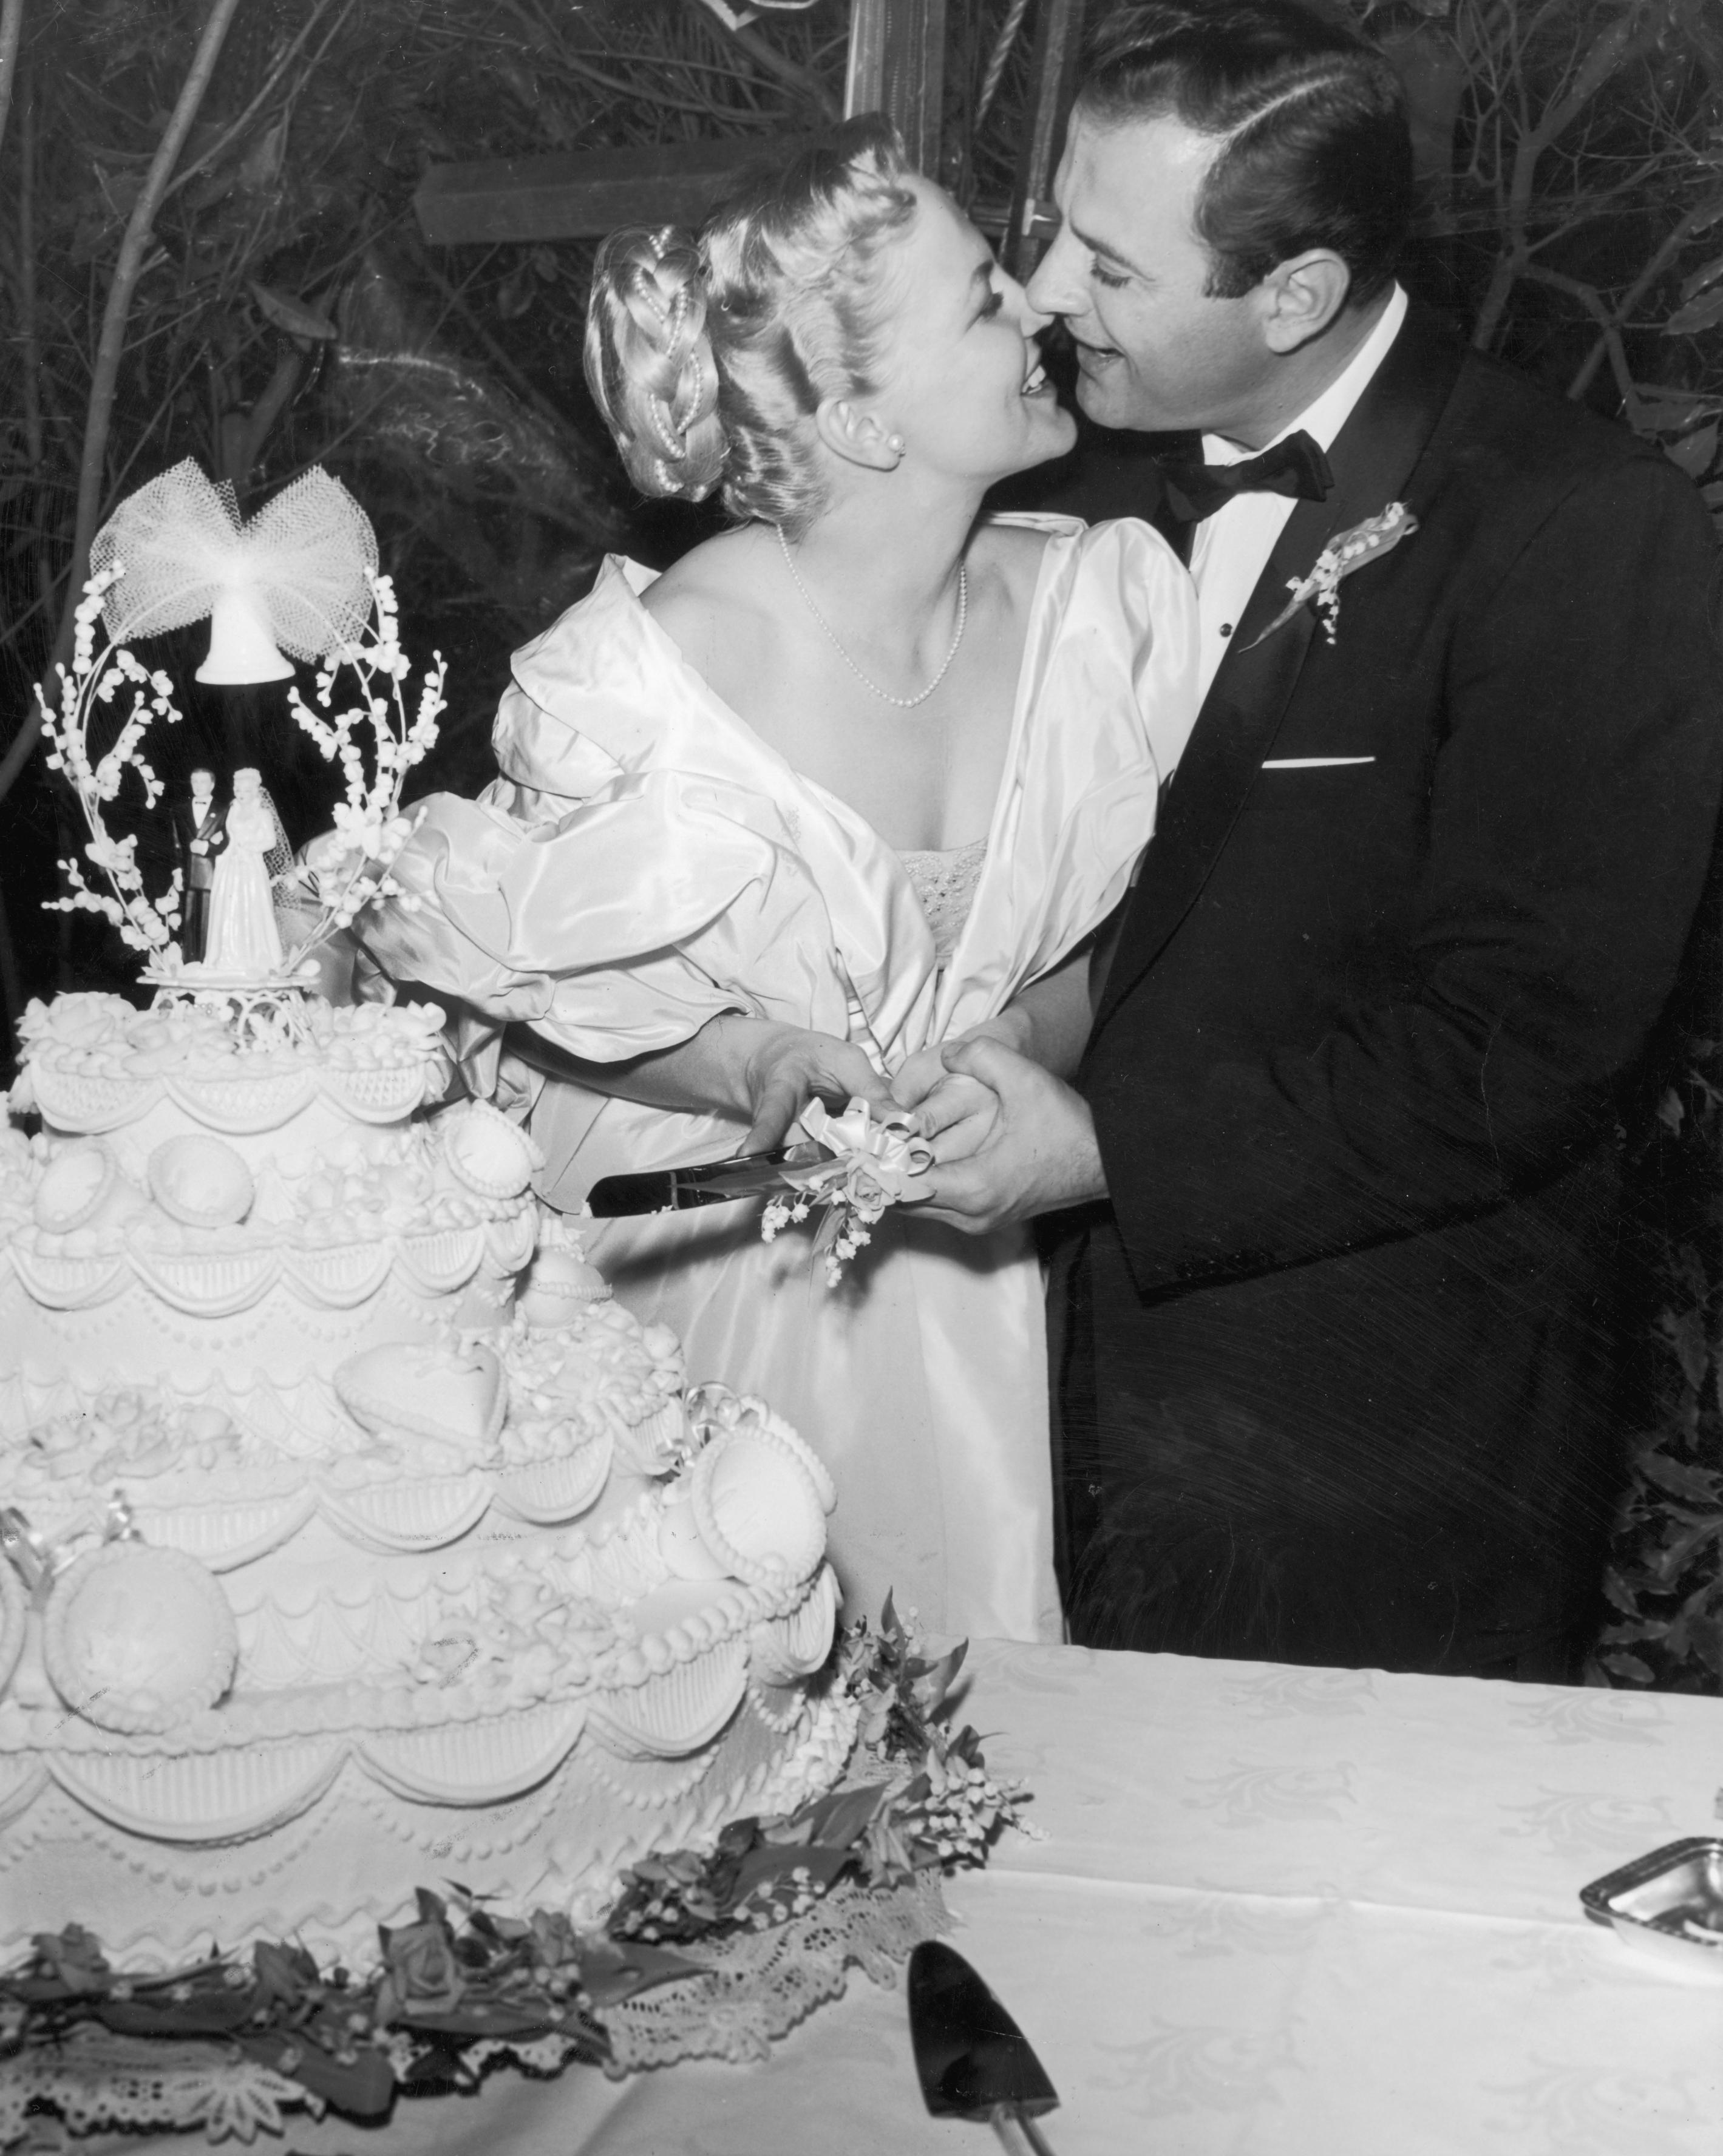 celebrity-vintage-wedding-cakes-peggy-lee-3206157-1015.jpg